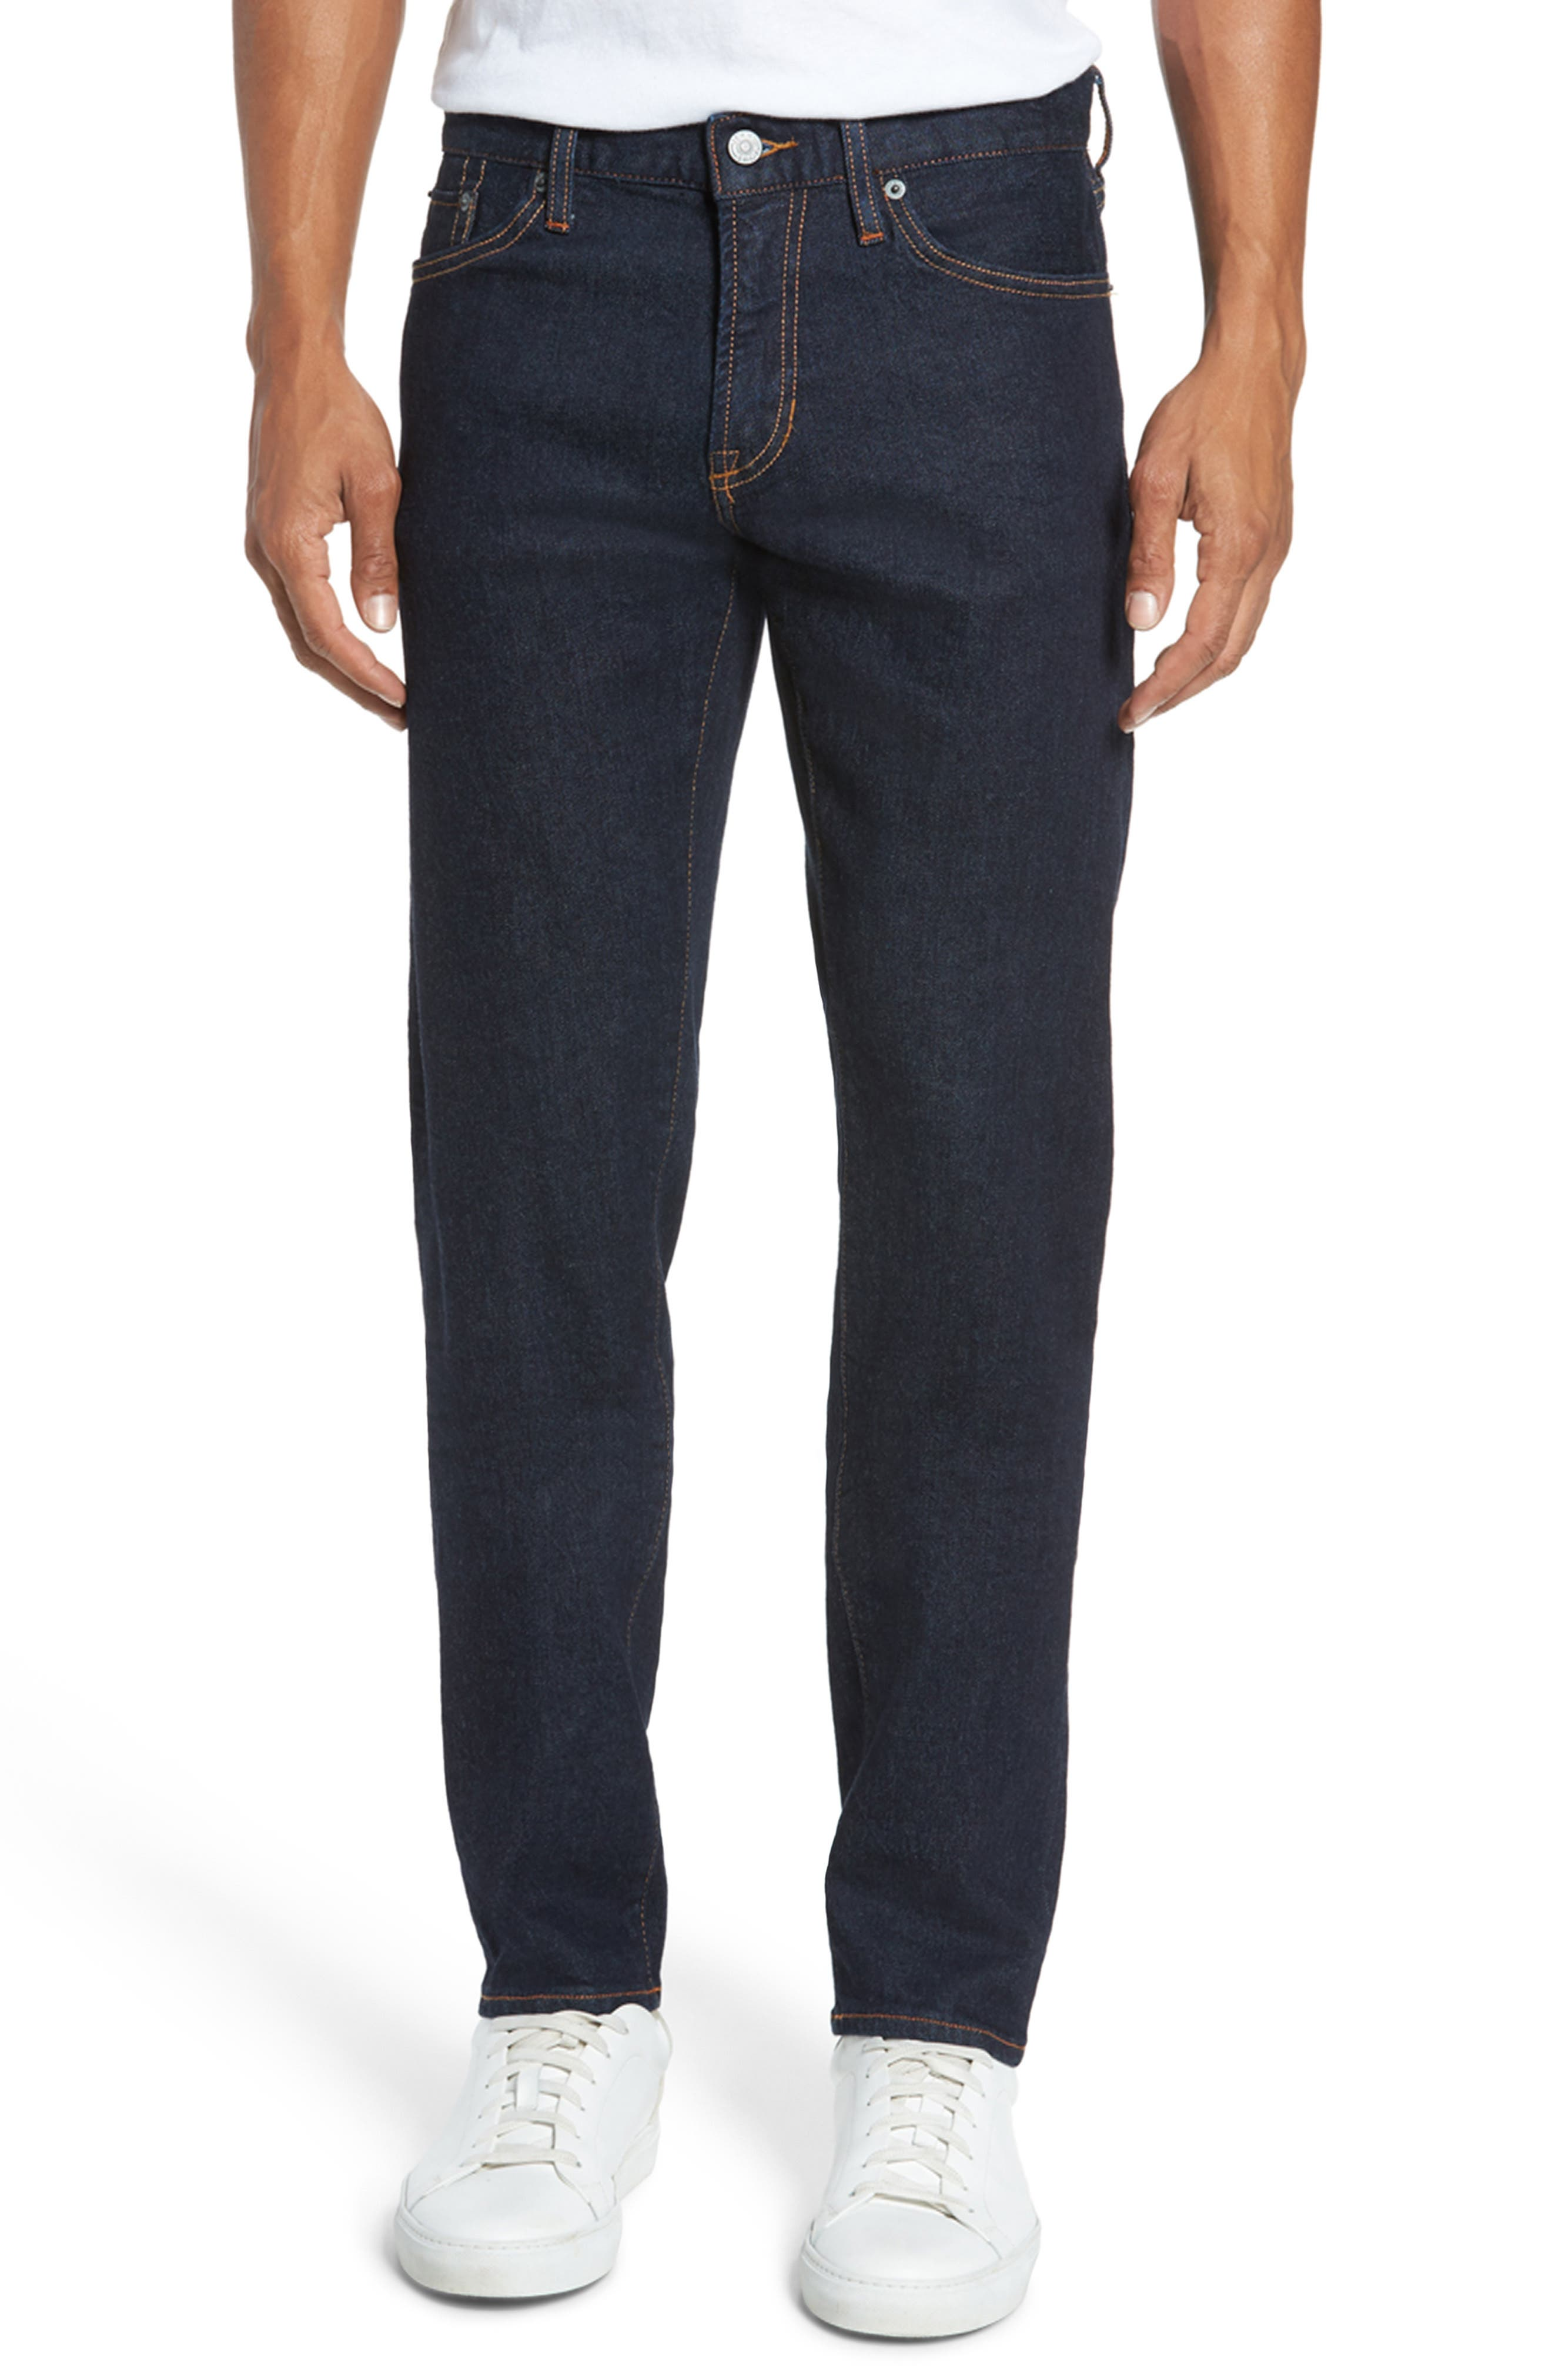 Jean Shop Jim Slim Fit Selvedge Jeans (Stretch Rinse)